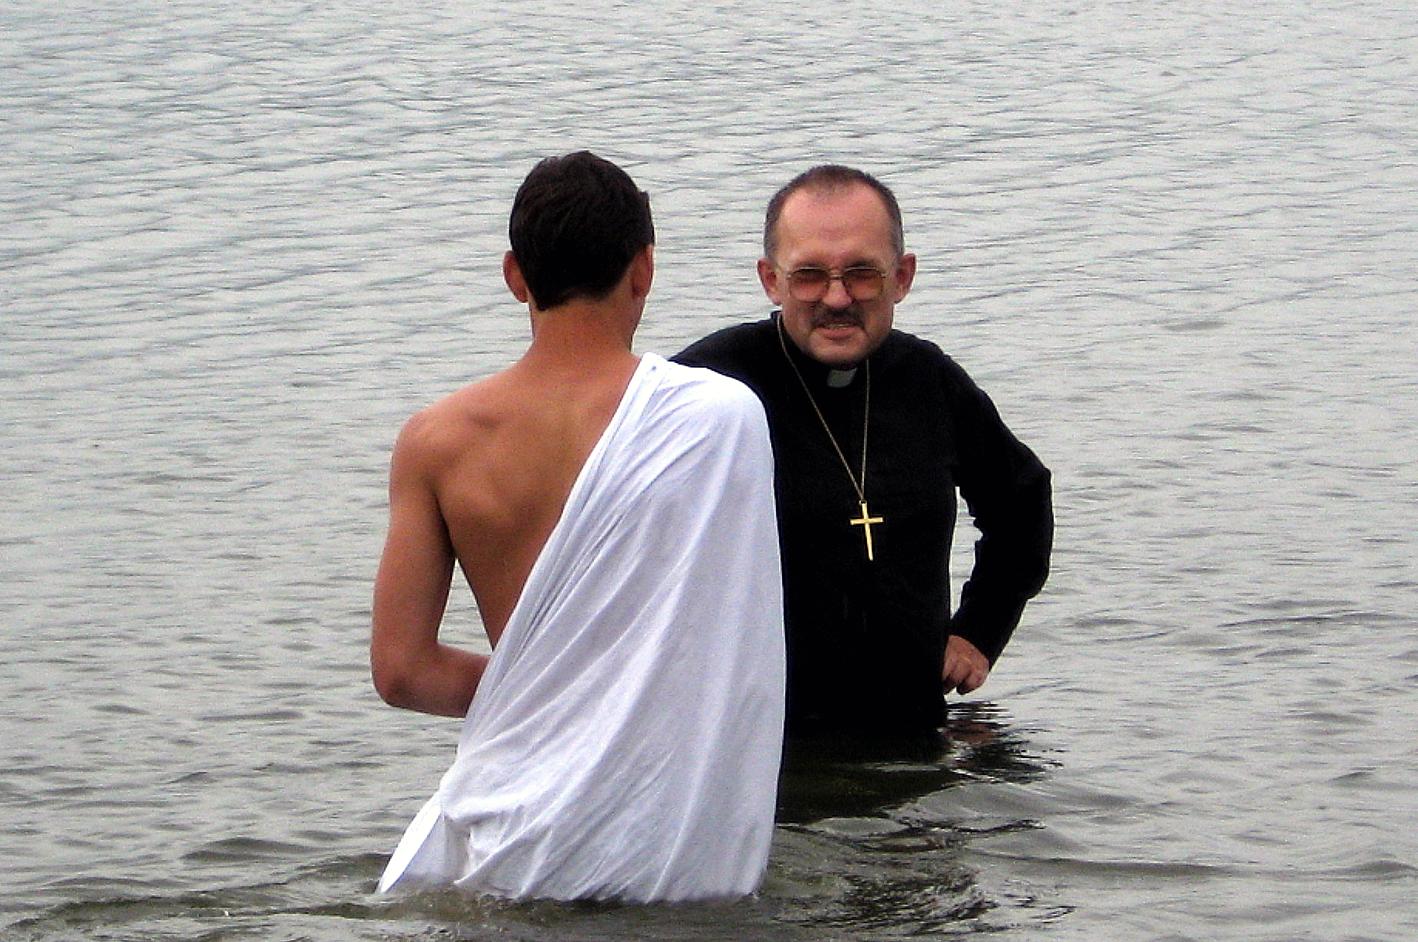 Rev. Igor Volovodov, pastor of Peter and Paul United Methodist Church in Vovonezh, Russia, baptizes a parishioner. 2008 file photo by Jan Snider, United Methodist Communications.